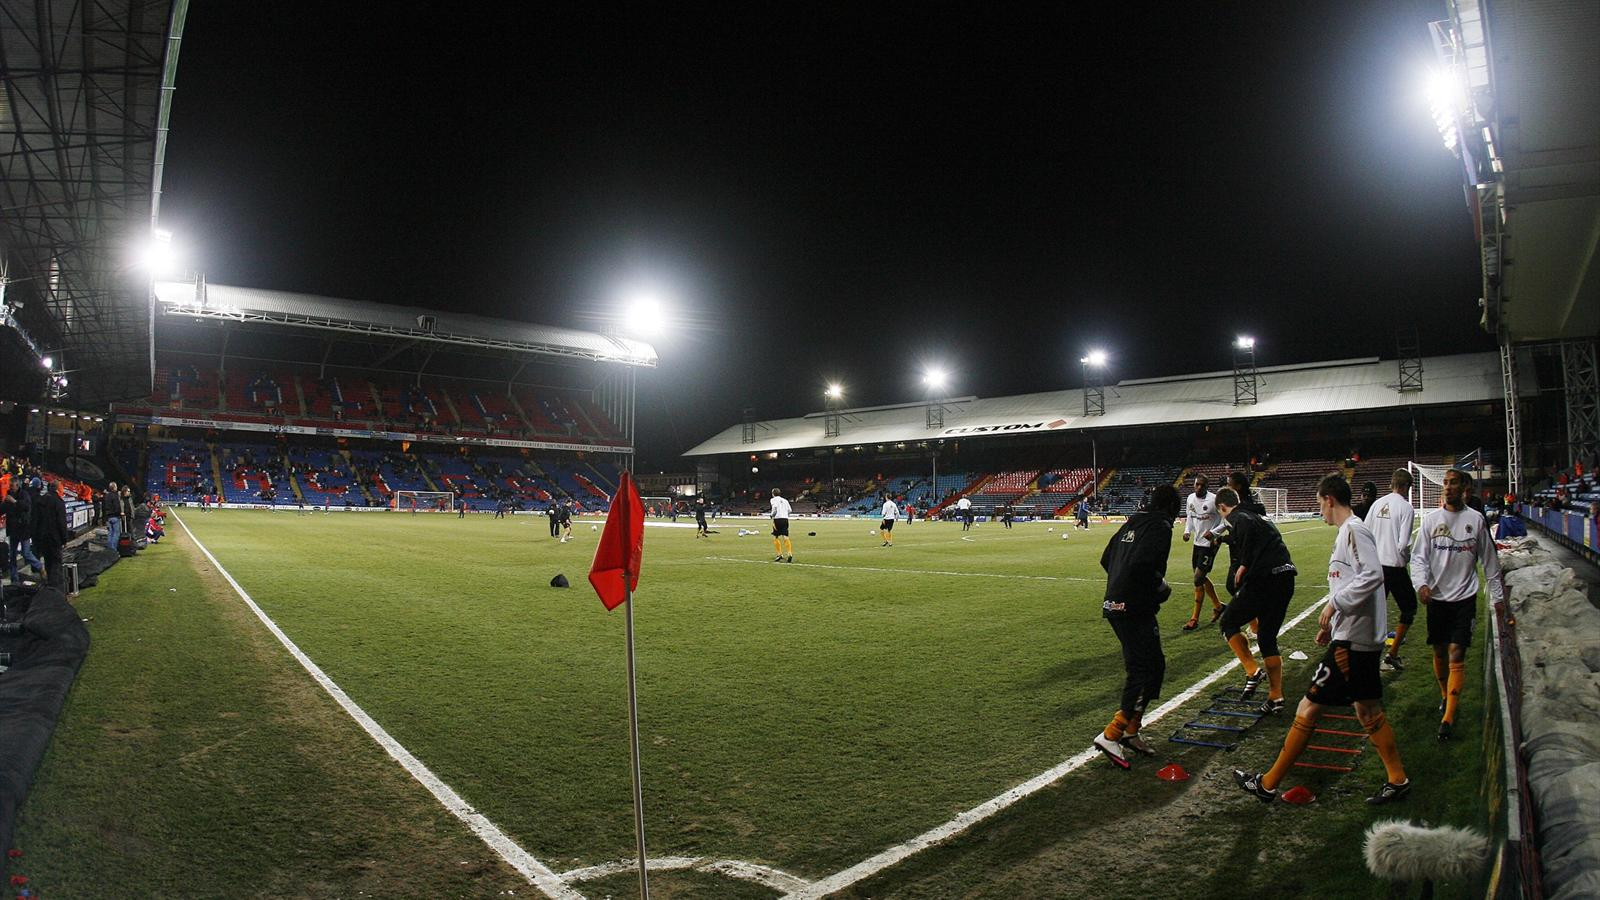 LIVE Crystal Palace - Southampton Premier League - 12 september 2020